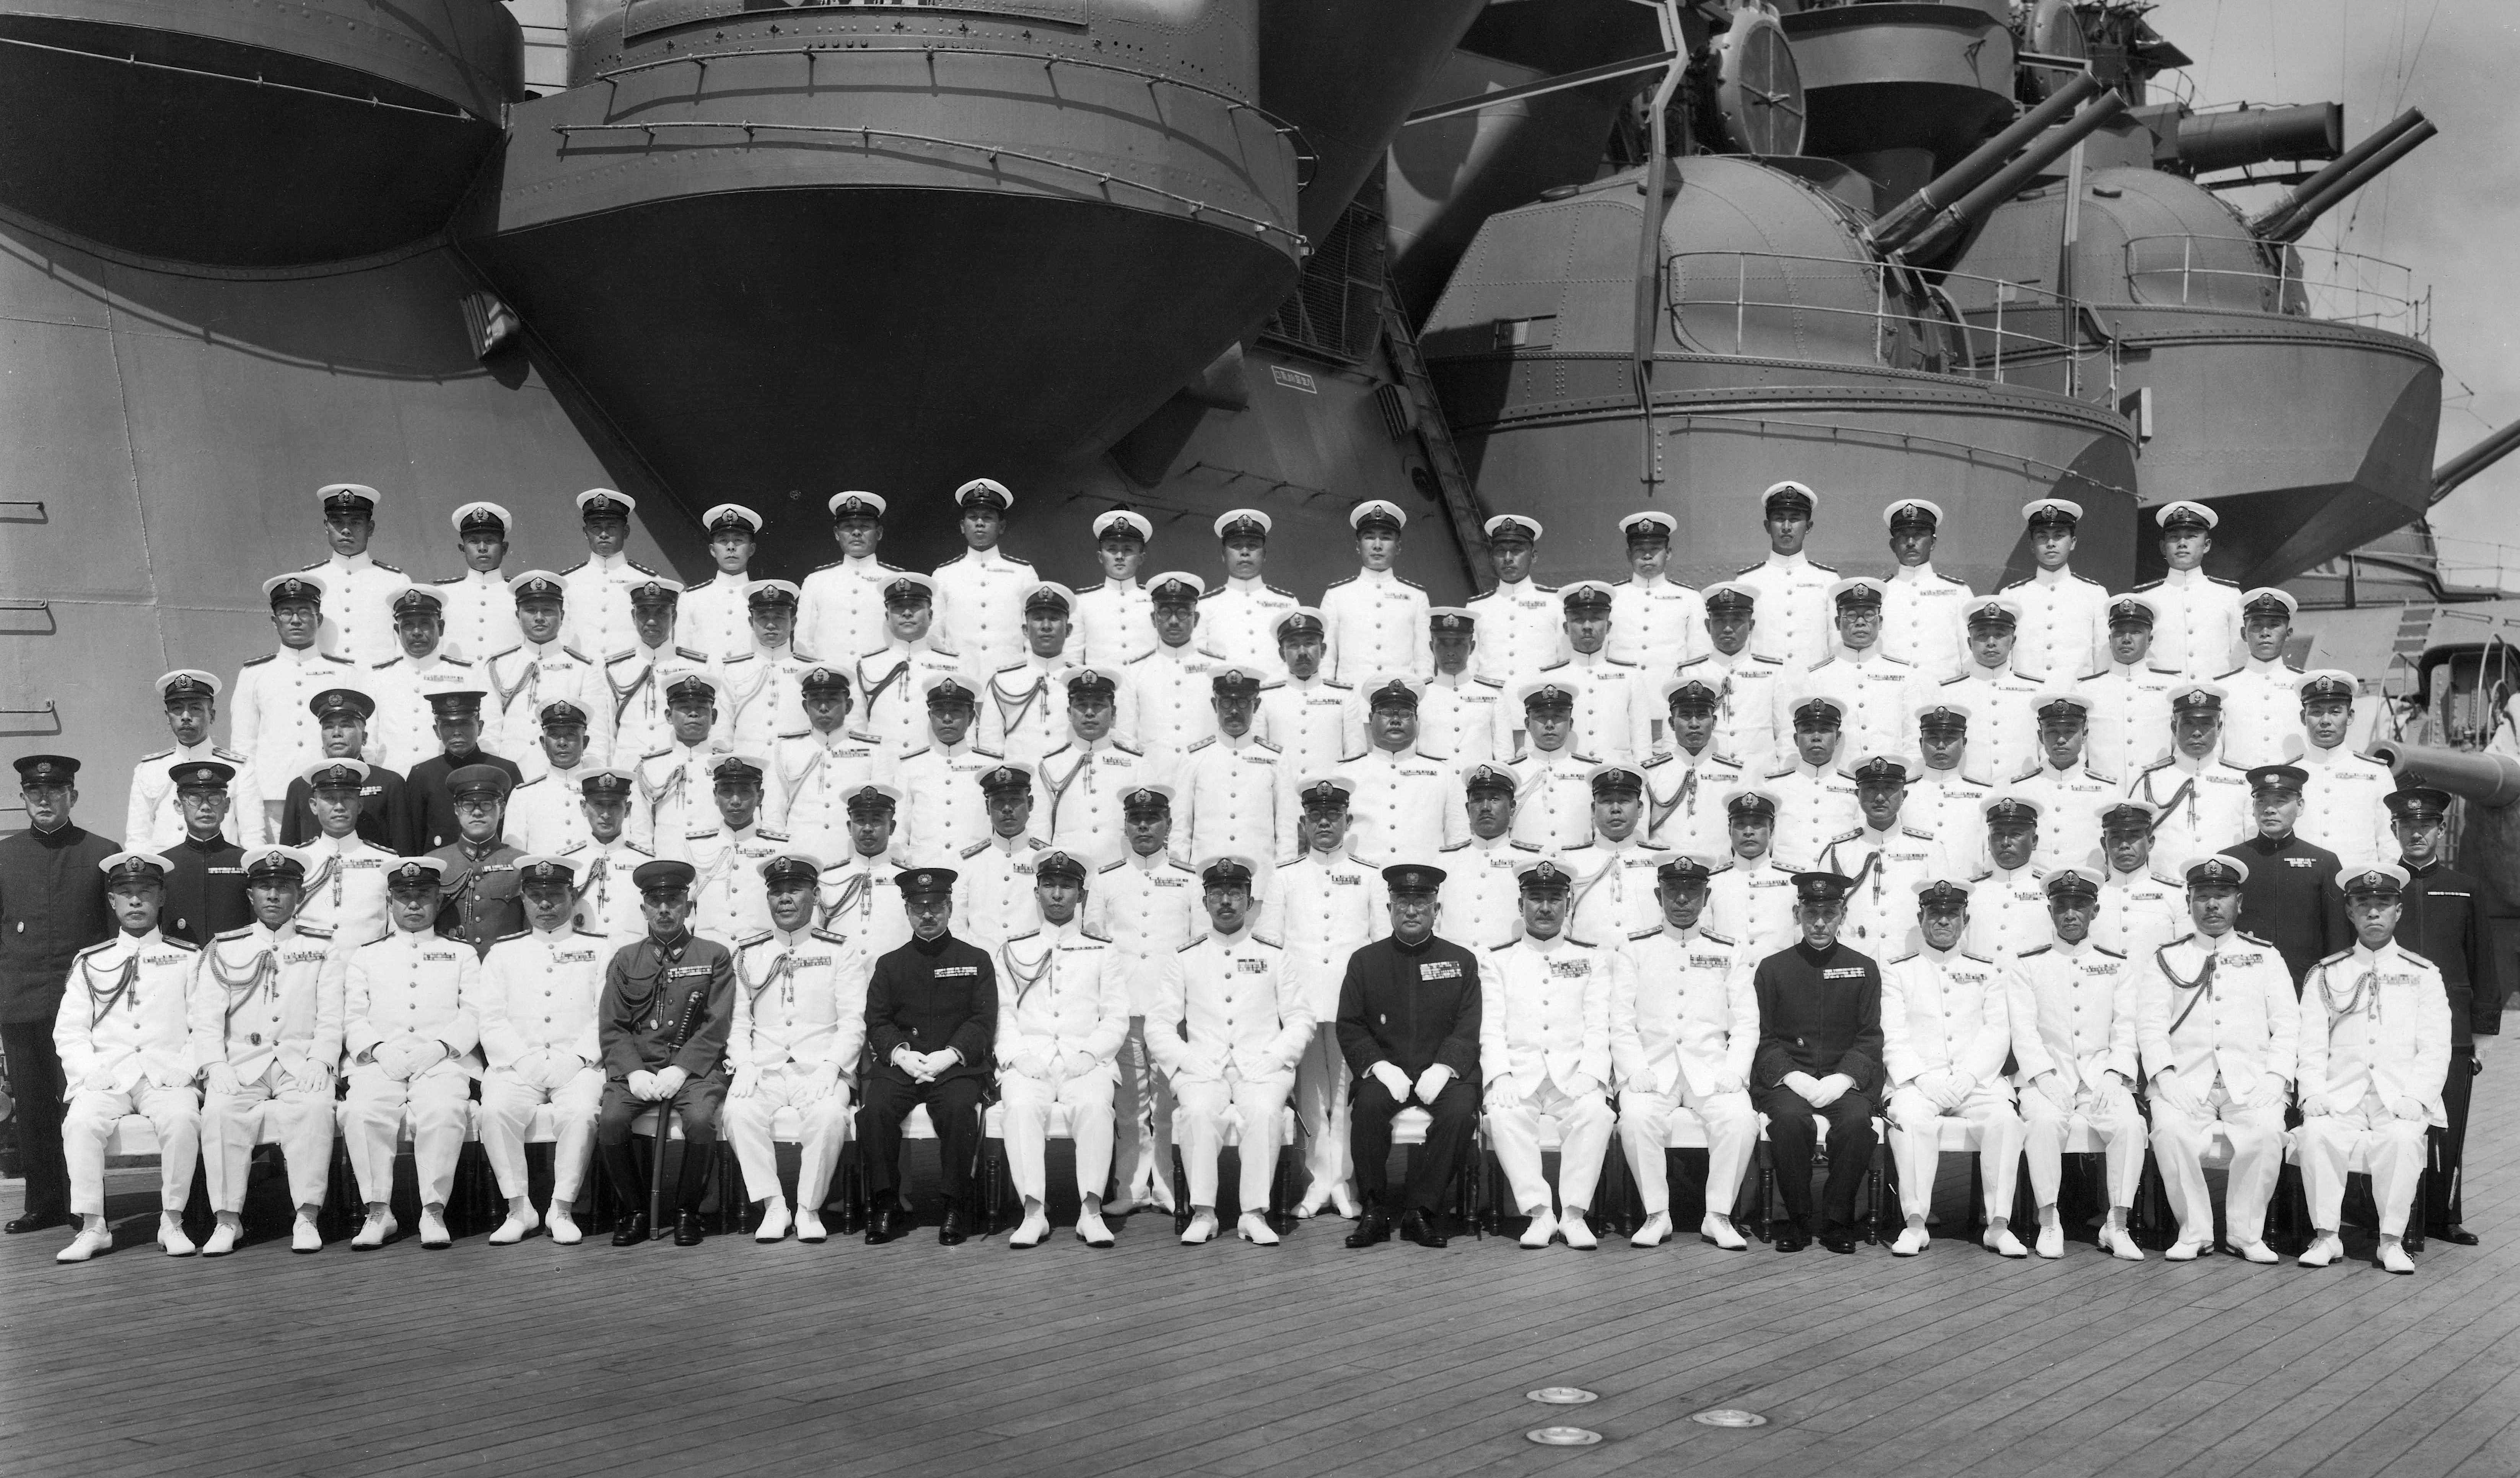 file aboard battleship musashi 24 june 1943 jpg wikimedia commons